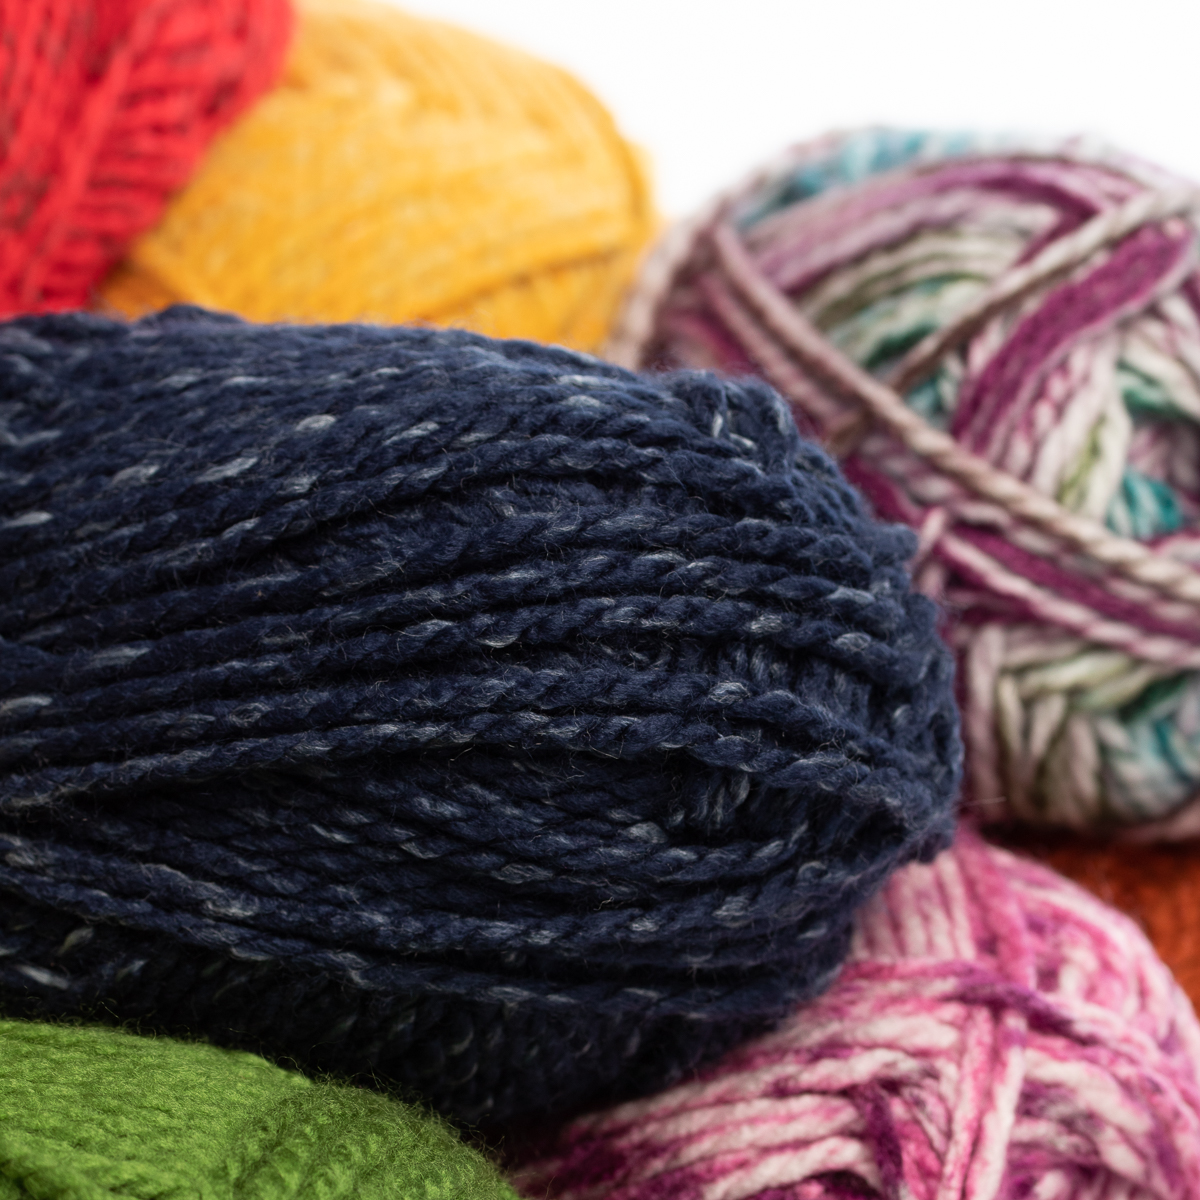 3pk-Premier-Yarns-Deborah-Norville-Serenity-100-Acrylic-Yarn-Chunky-5-Knitting thumbnail 74